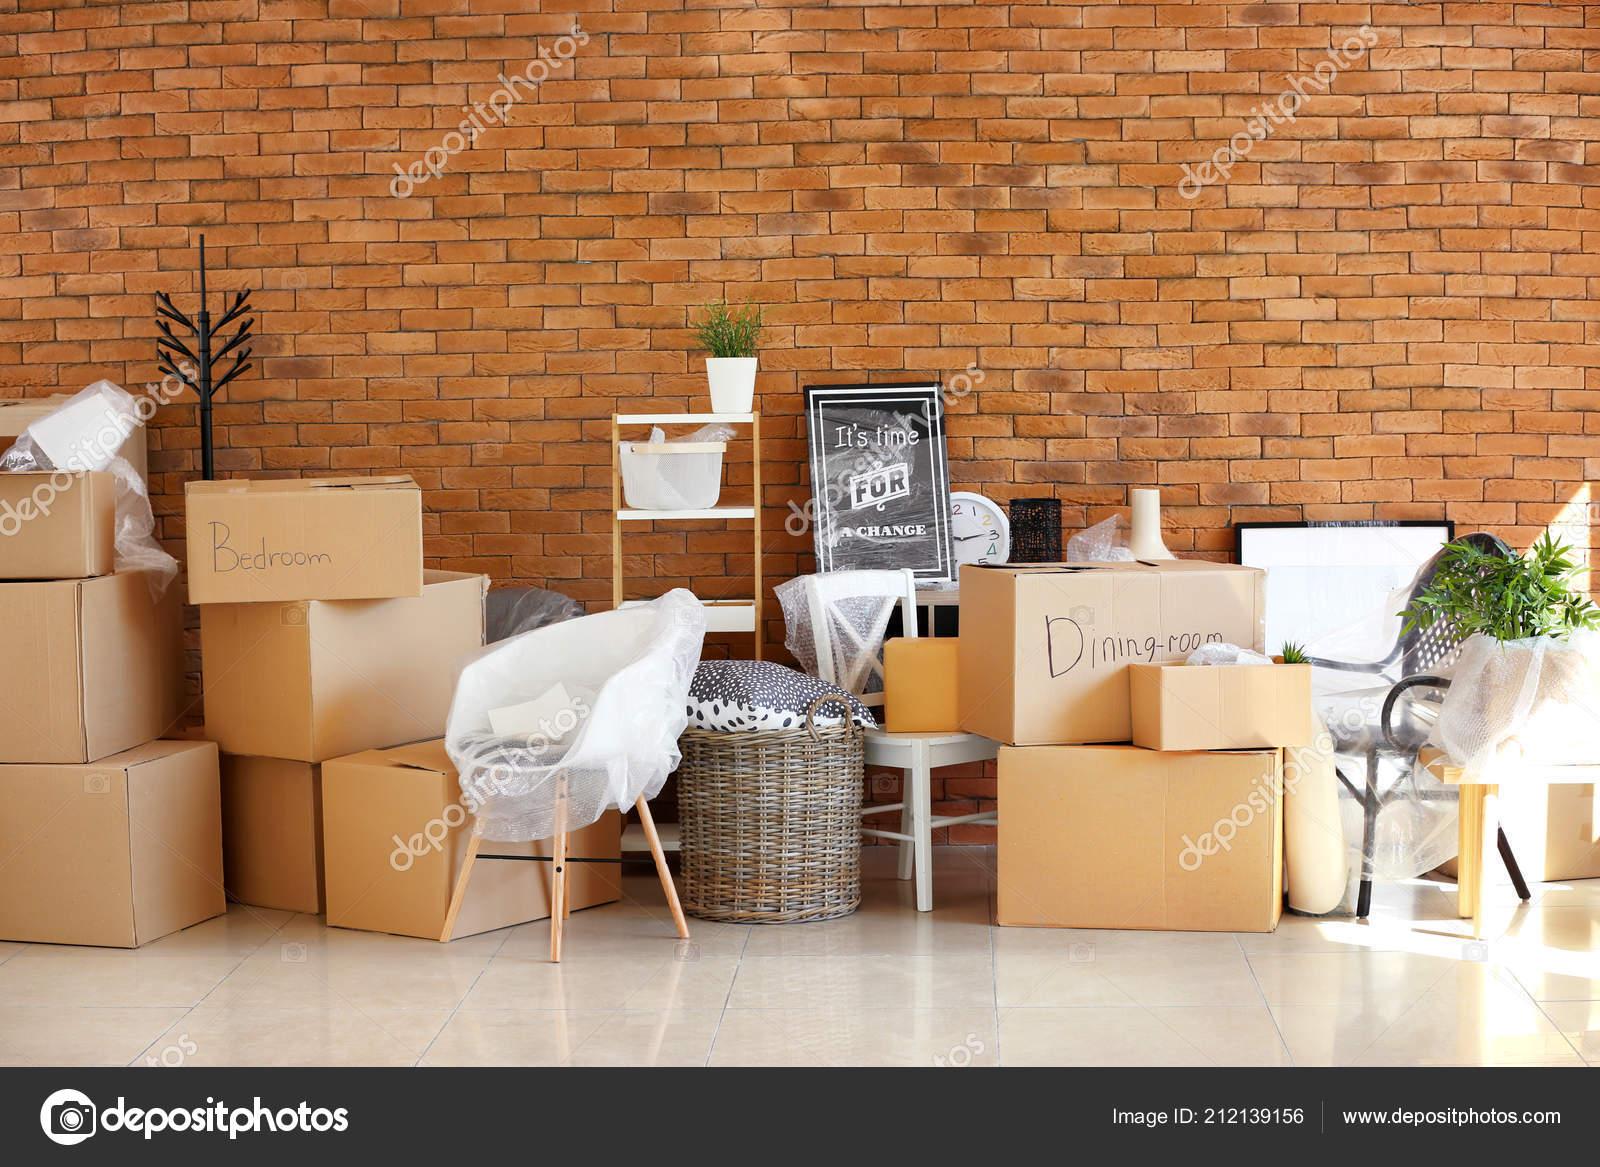 Carton Boxes Interior Items Room Moving House Concept Stock Photo C Serezniy 212139156